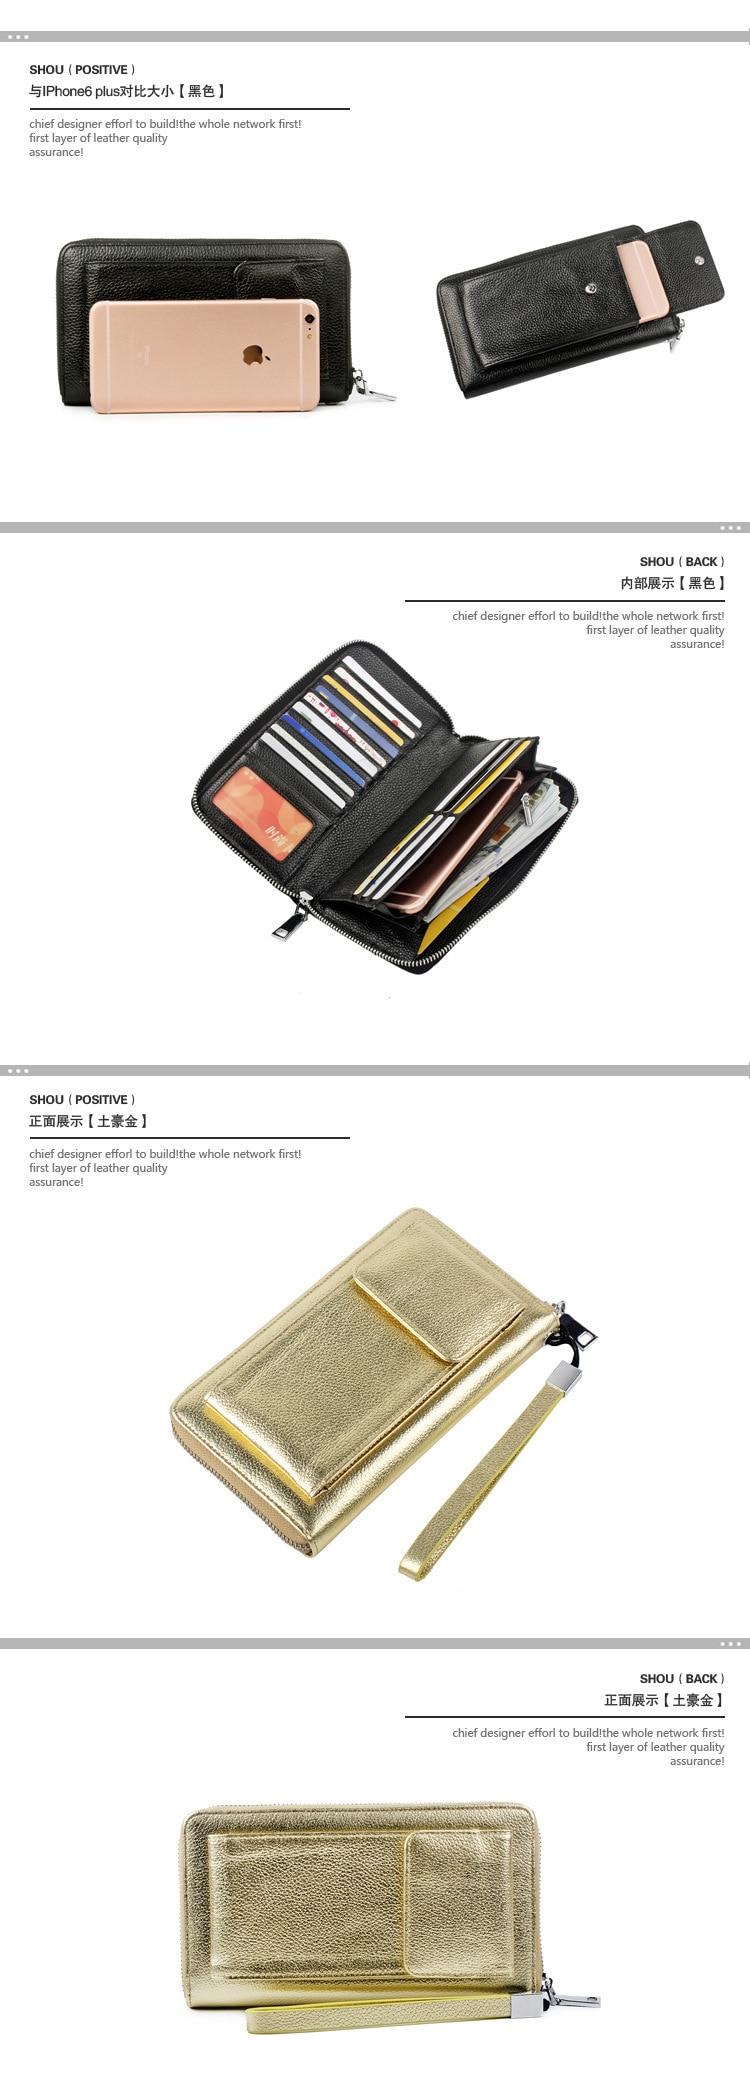 FB Jewels 14k White Gold Pear 3-Prong Cast Medium Weight V-End TruSeatr 4 x 2.5mm Pendant Setti